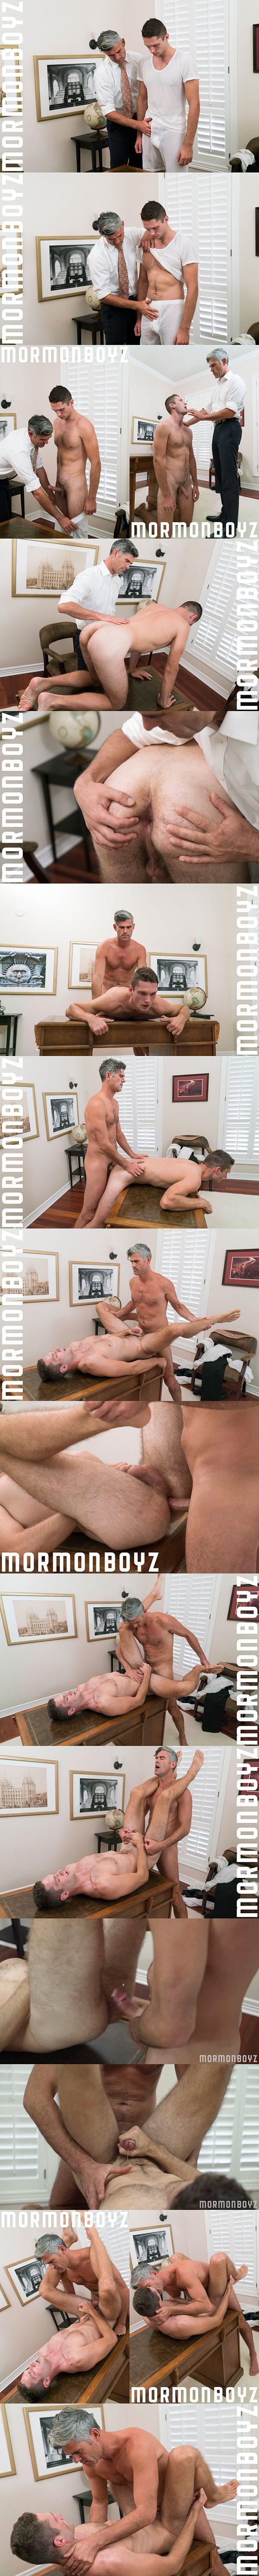 President Oaks barebacks hot Russian jock Elder Dobrovnik's virgin ass at Mormonboyz 02